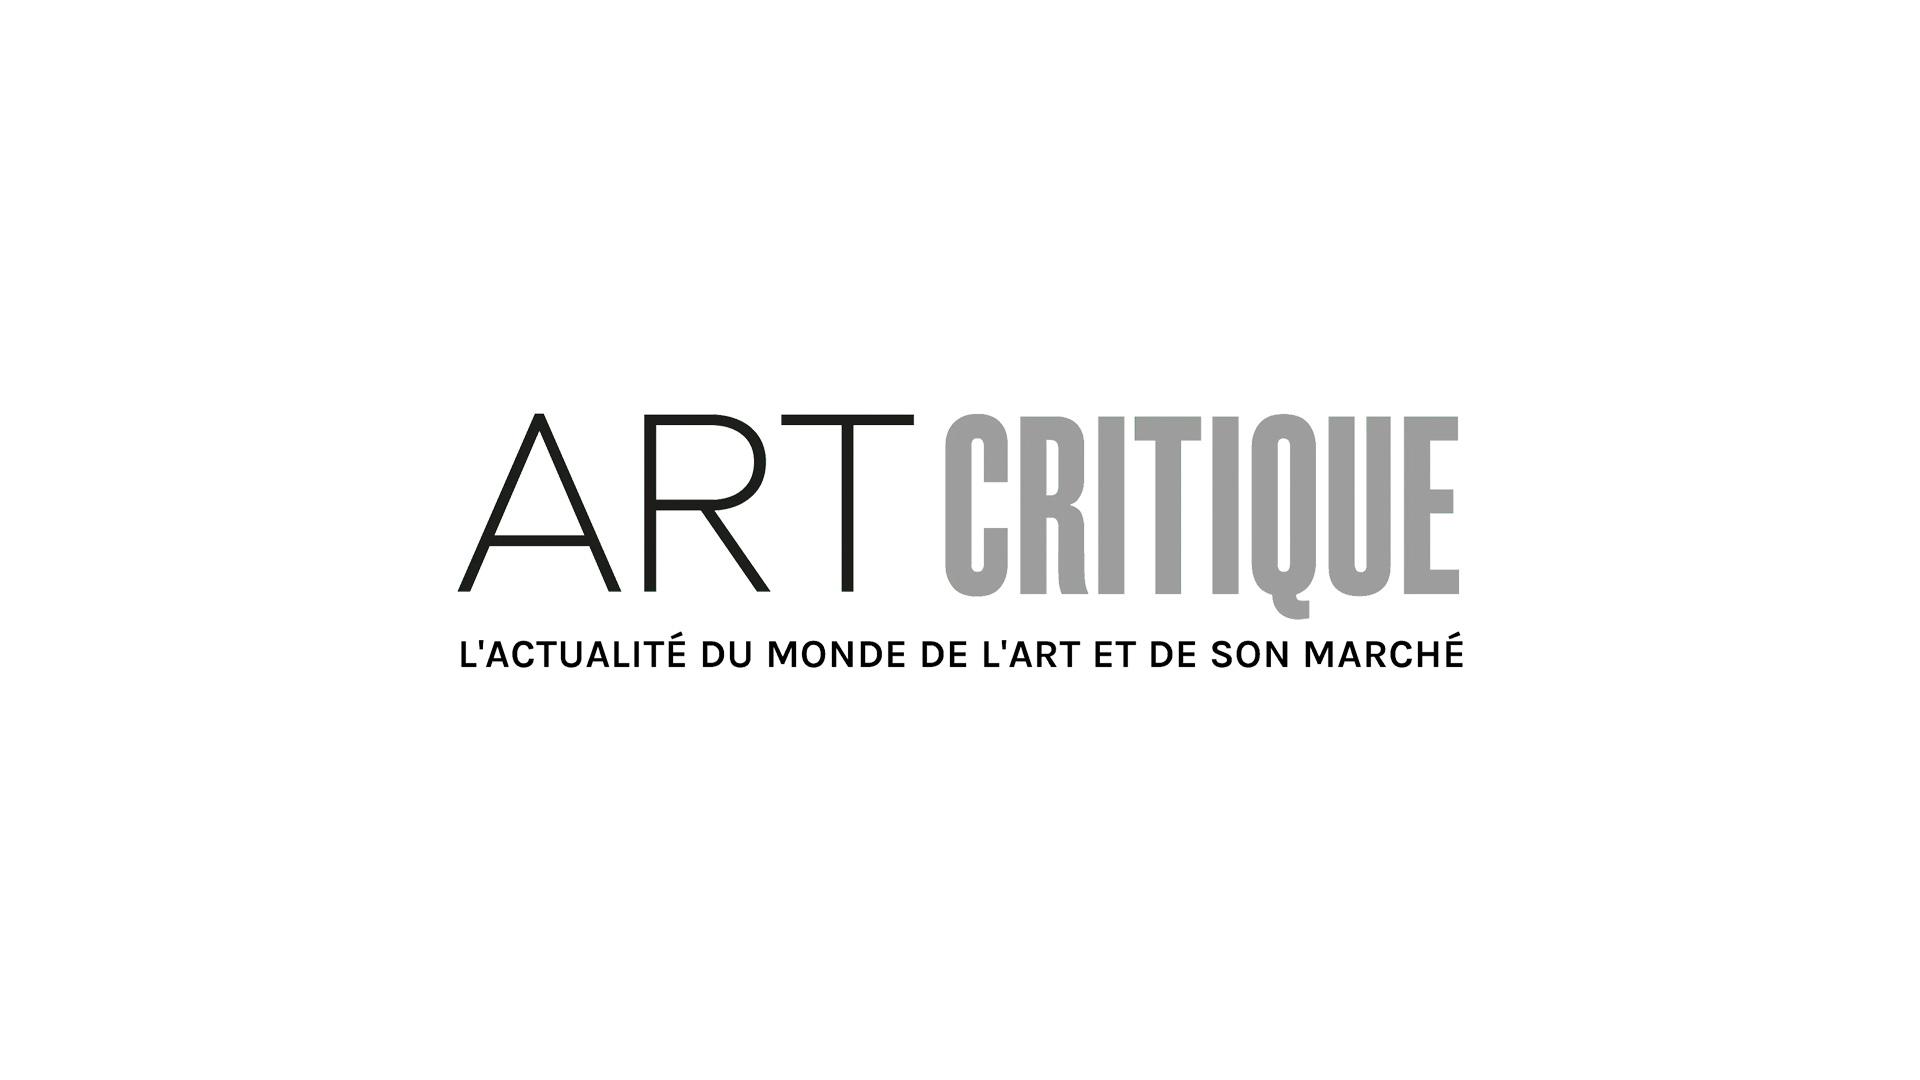 Self-portrait by Artemisia Gentileschi pops up in unusual places